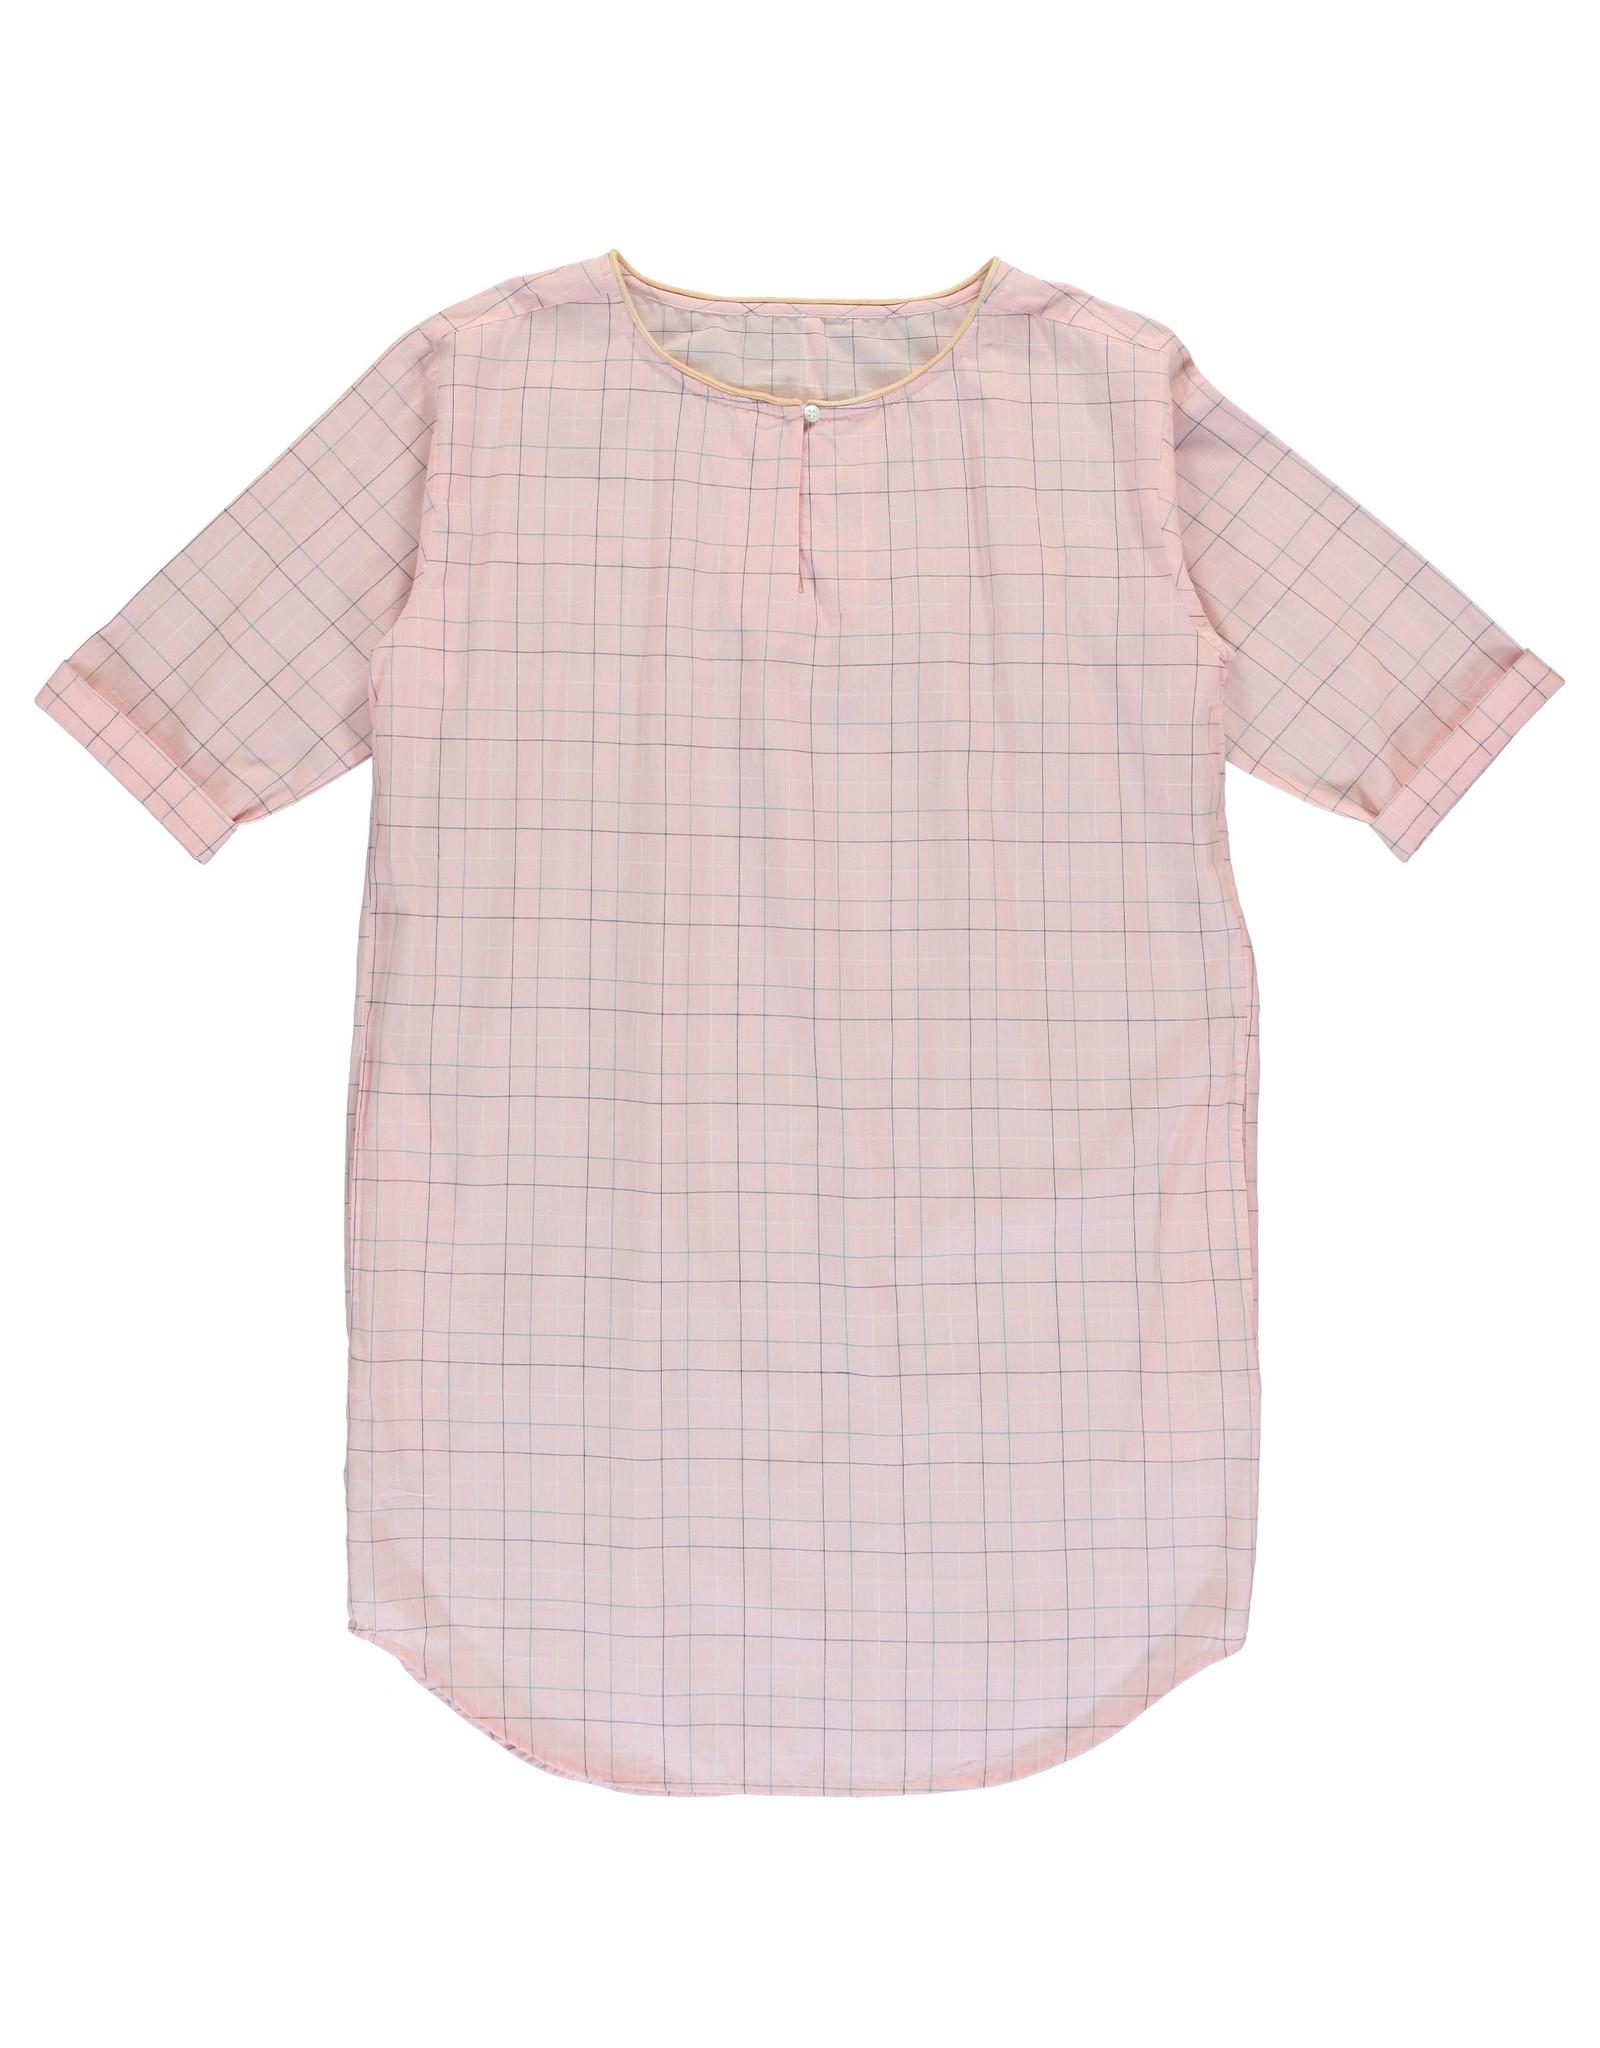 Dorélit Ceres   Nightdress   Pink